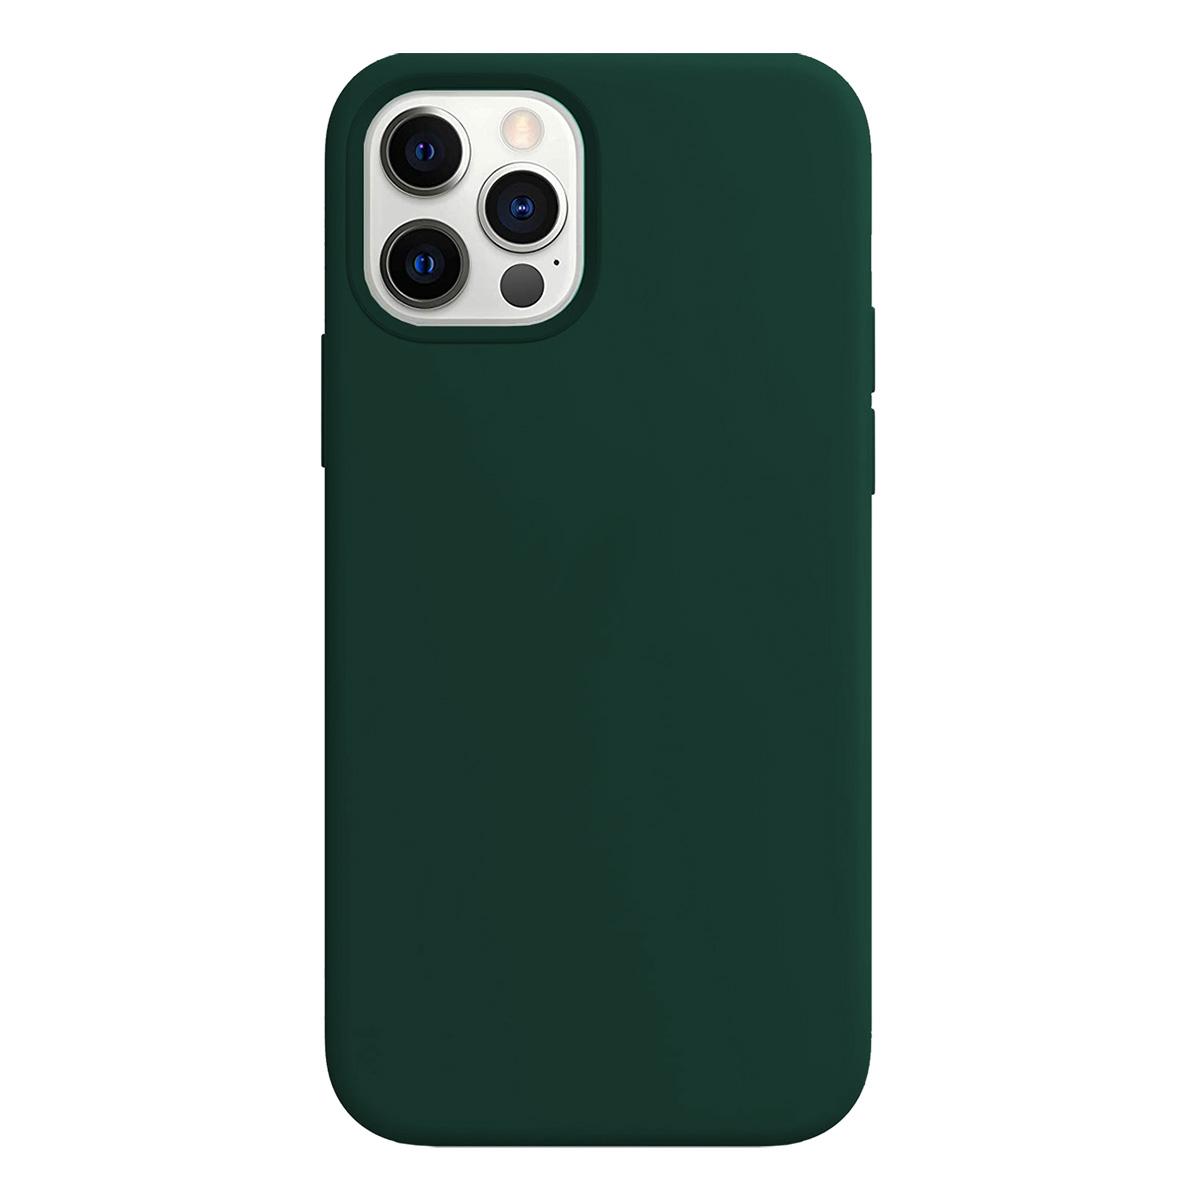 Buff iPhone 12 Pro Max Rubber S Kılıf Green